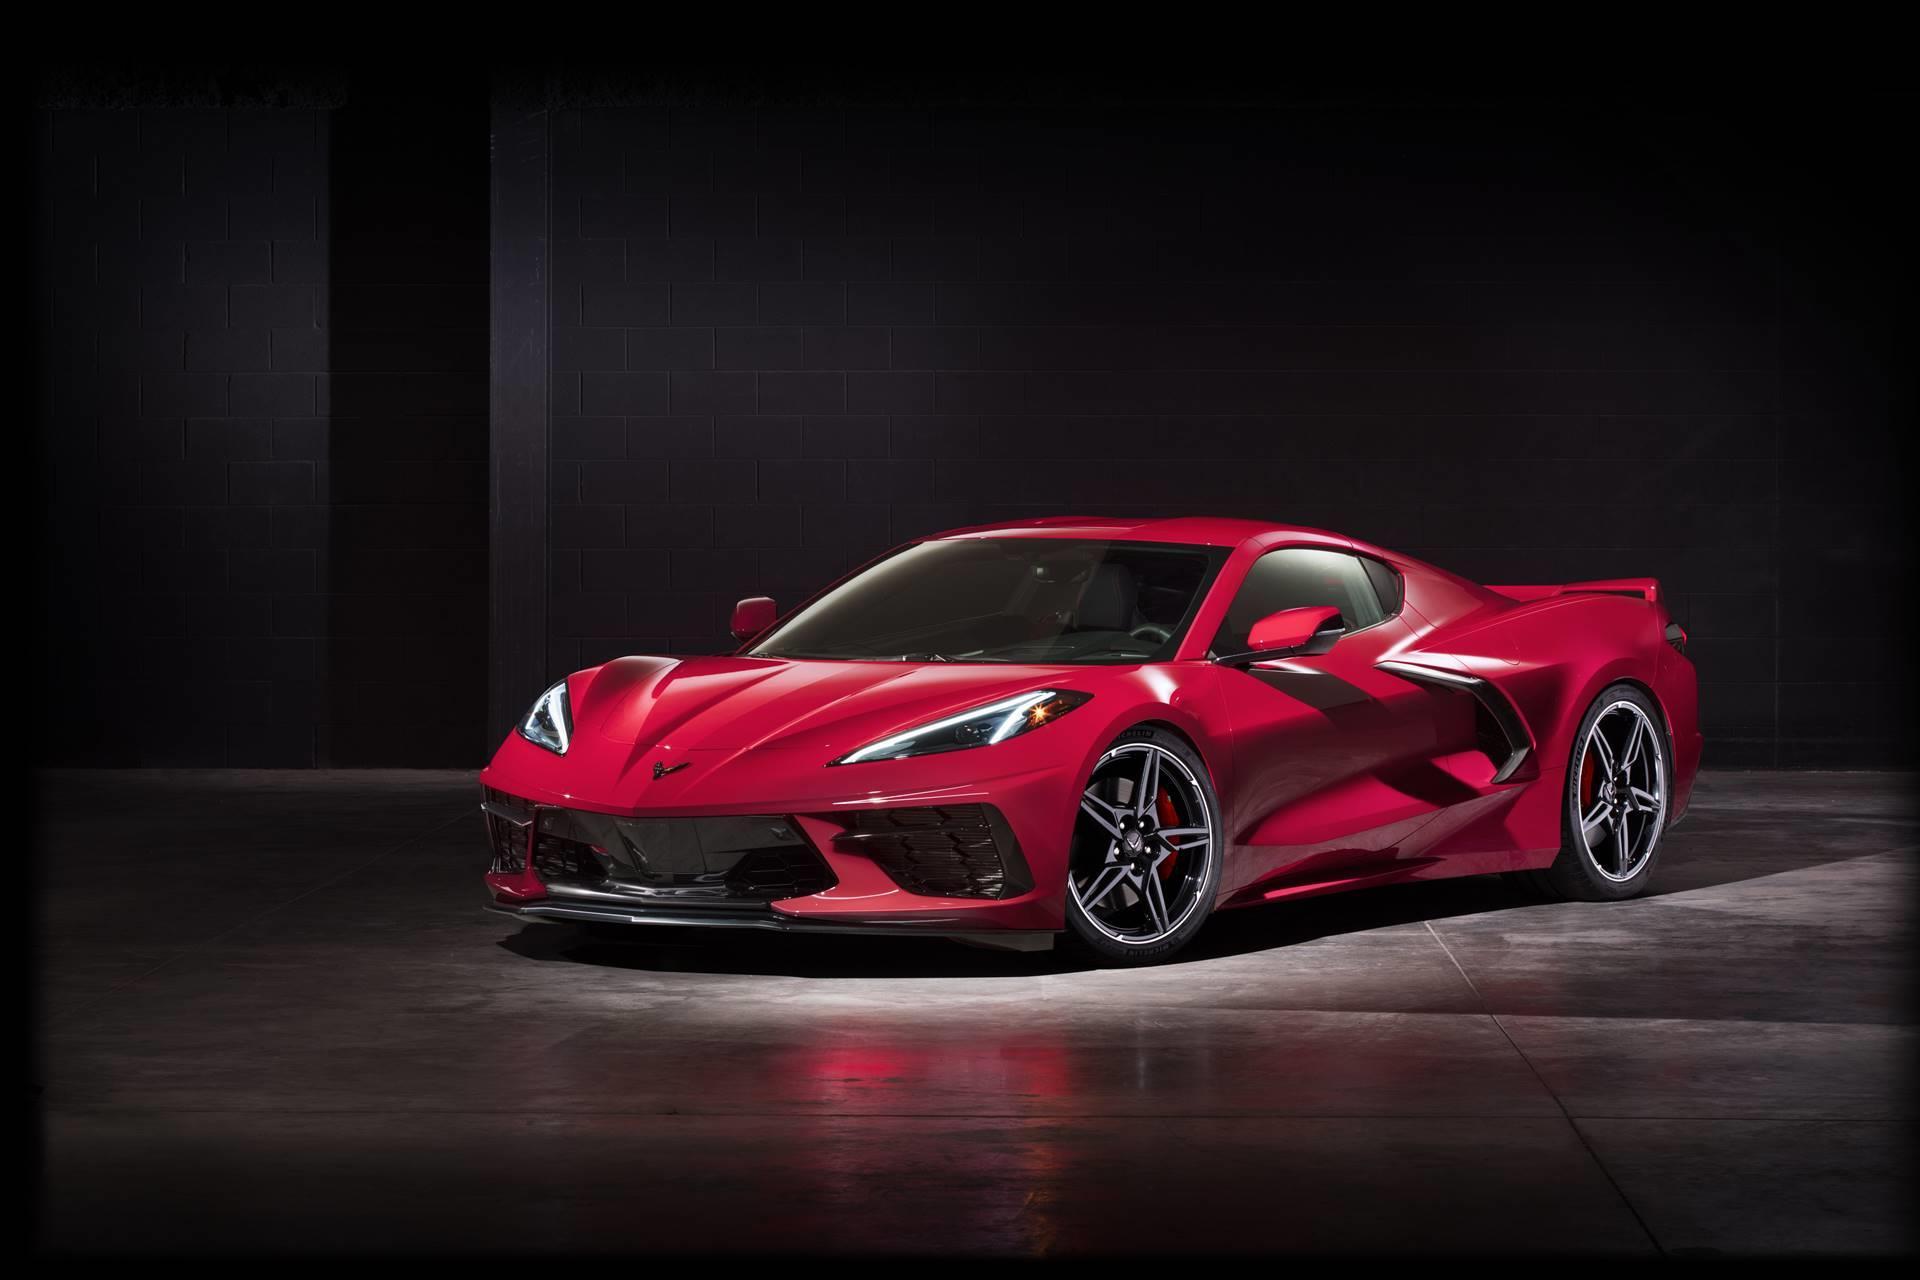 2020 Chevrolet Corvette Stingray technical and mechanical ...